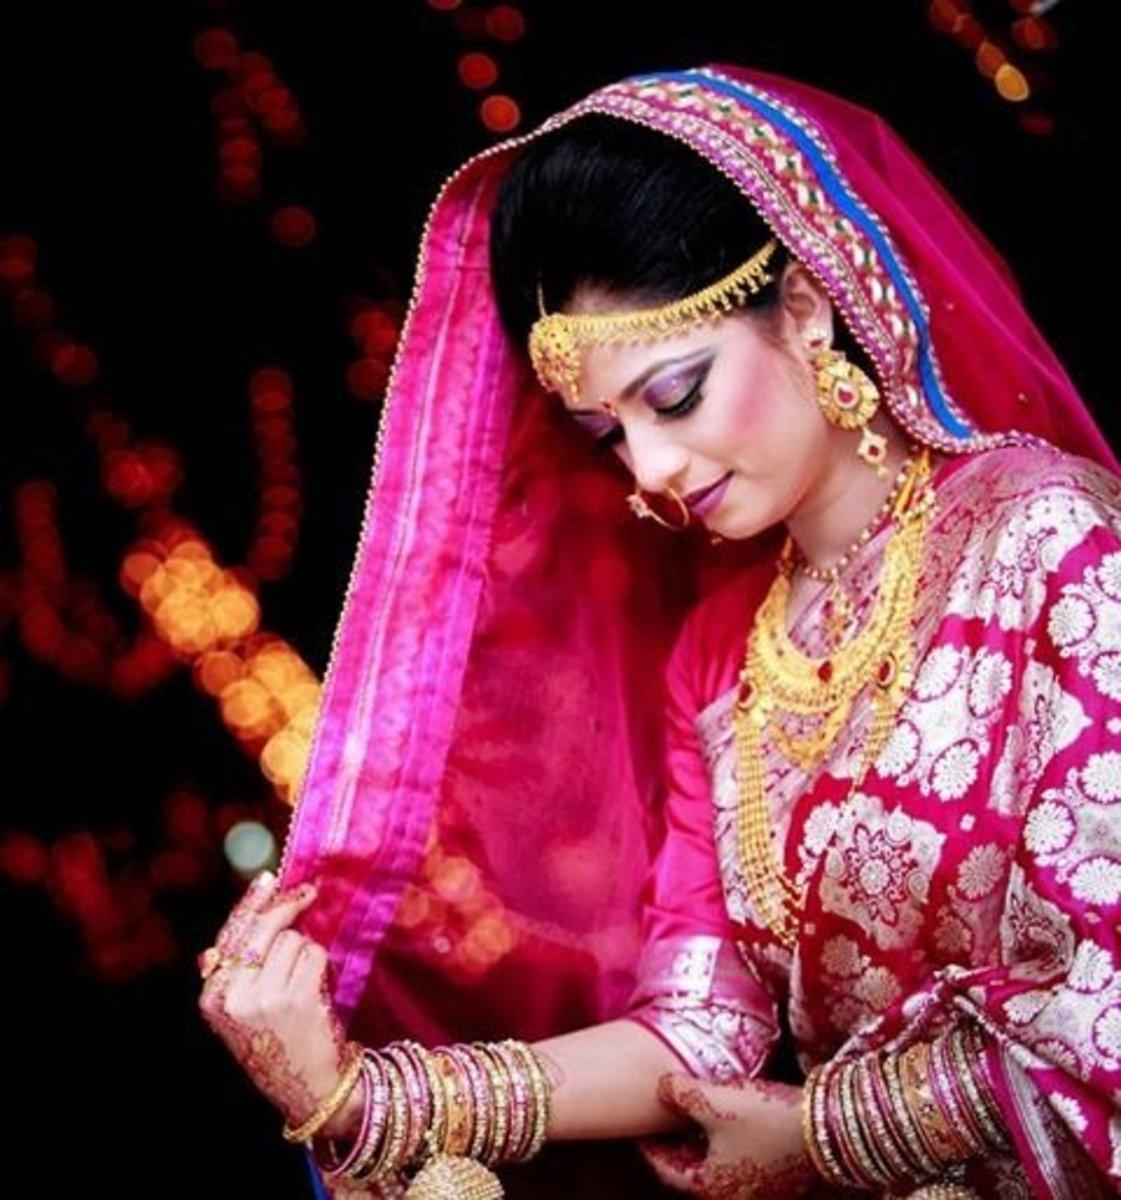 Magenta Bridal Katan Saree. Gorgeous Bangladeshi Bride wearing Hot pink / Magenta wedding katan saree.